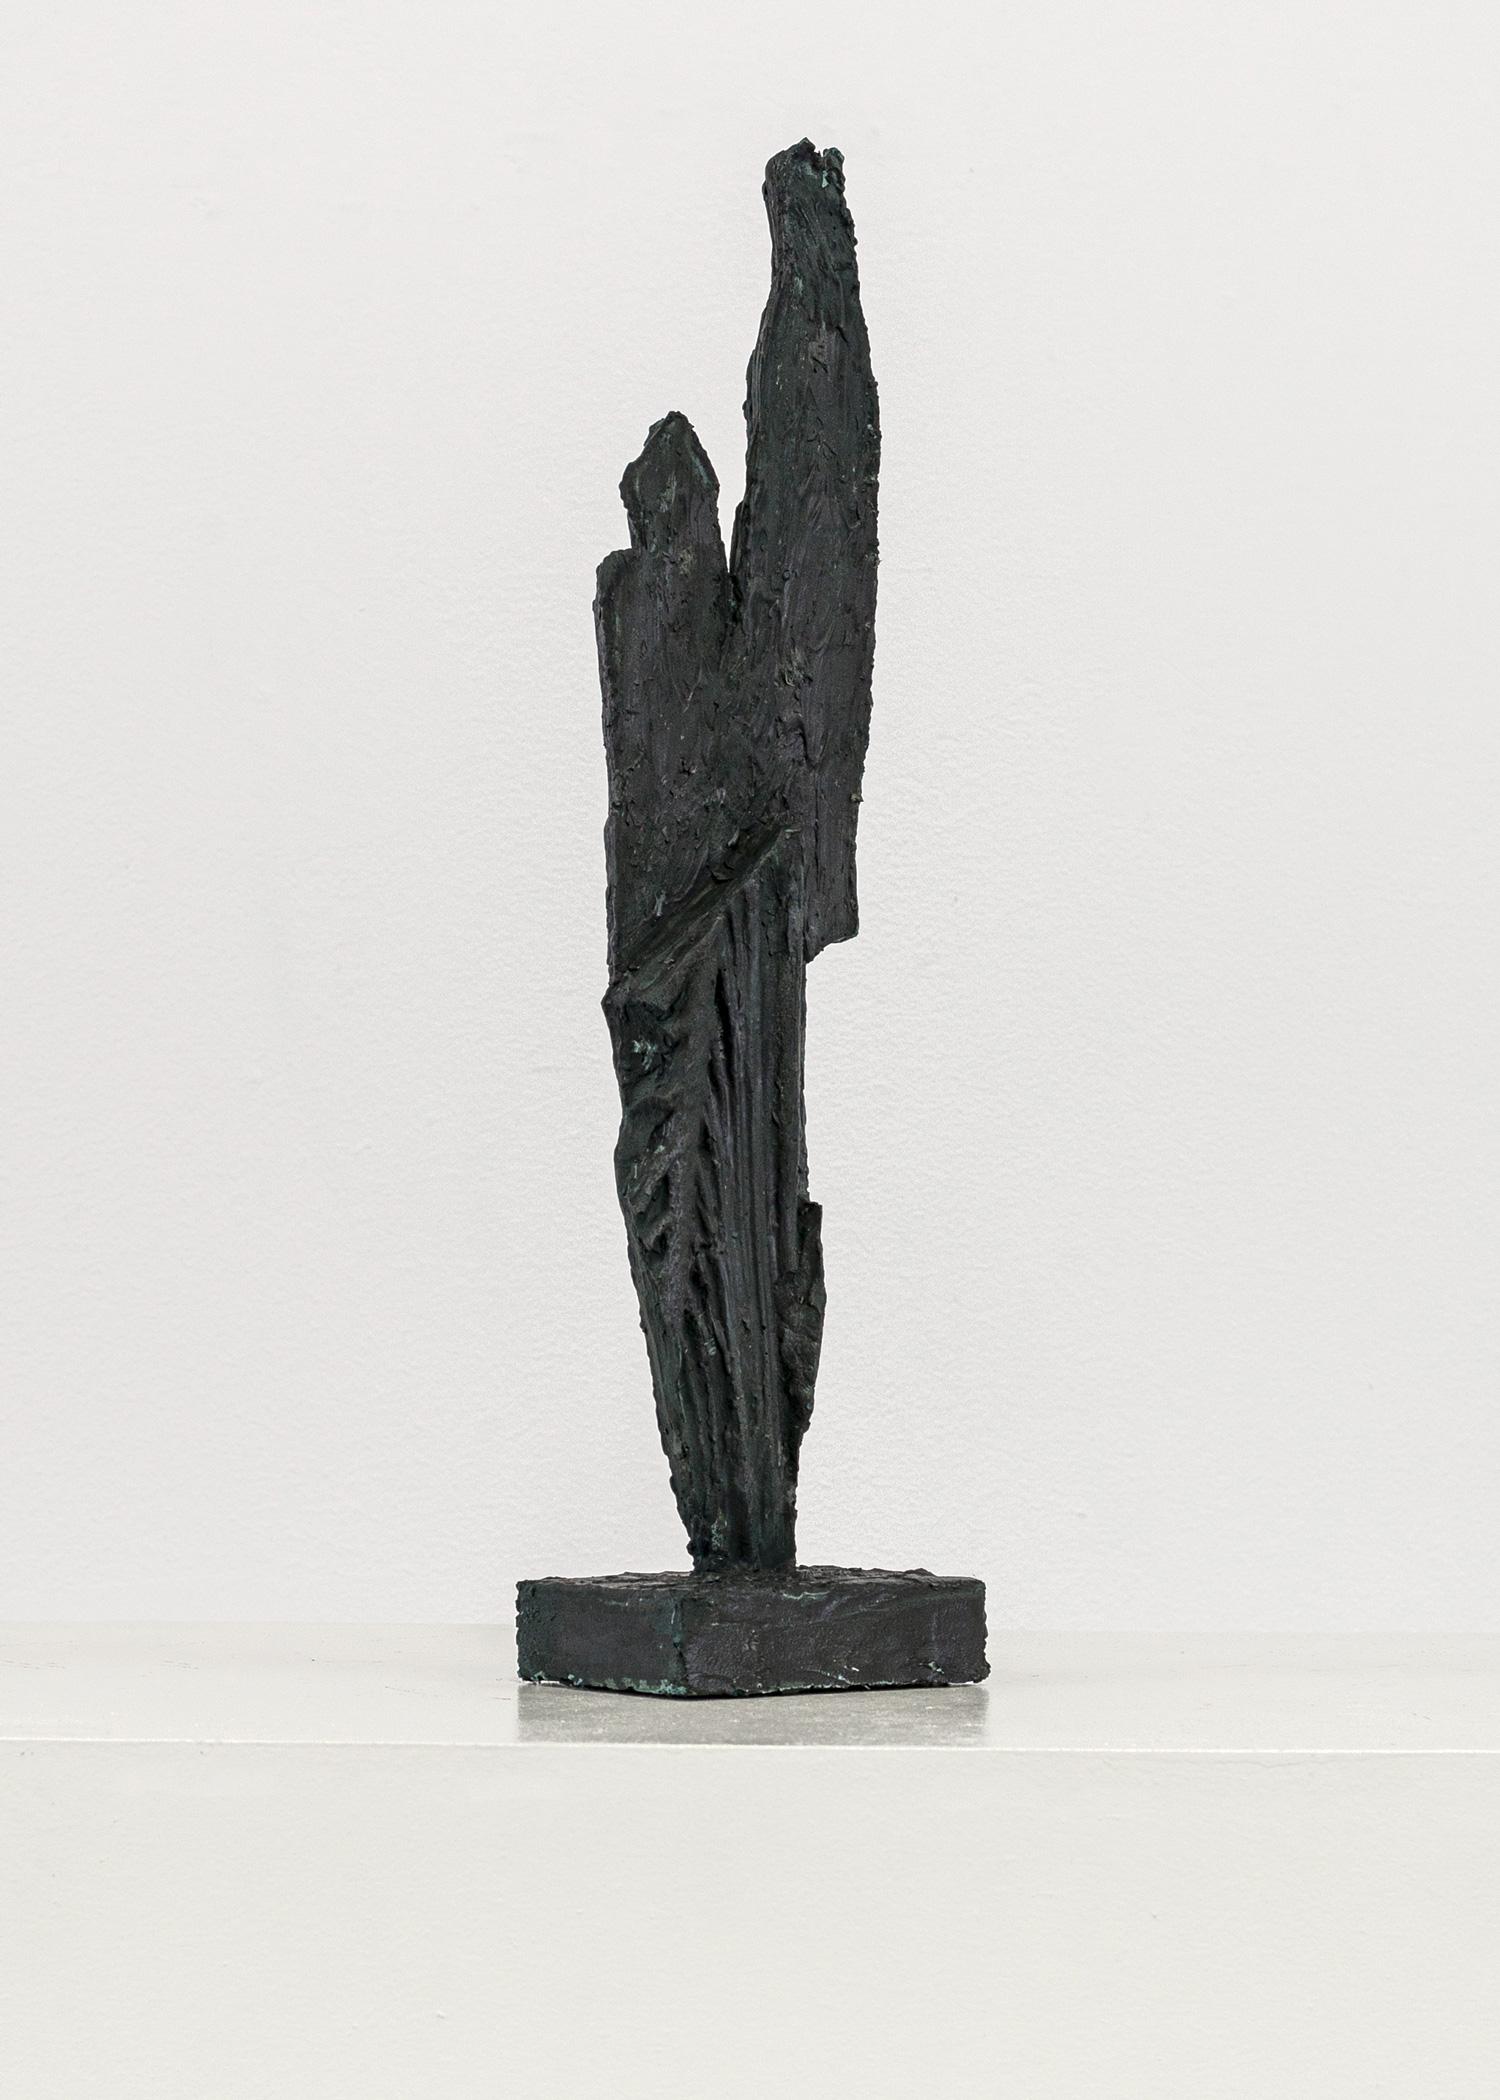 Fredrik Åkum - Sculpture